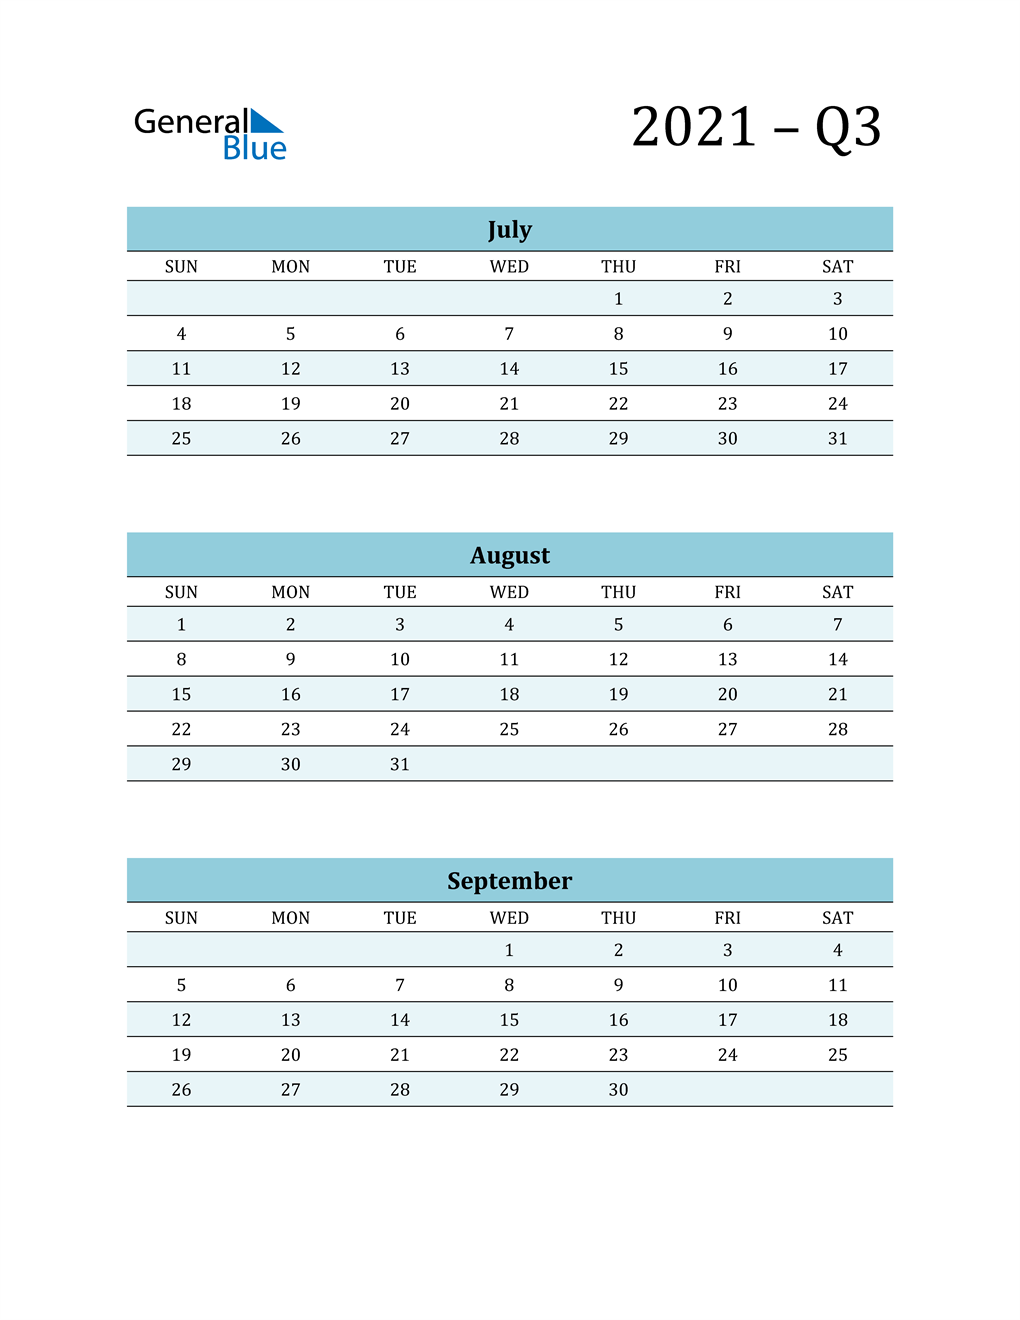 July, August, and September 2021 Calendar